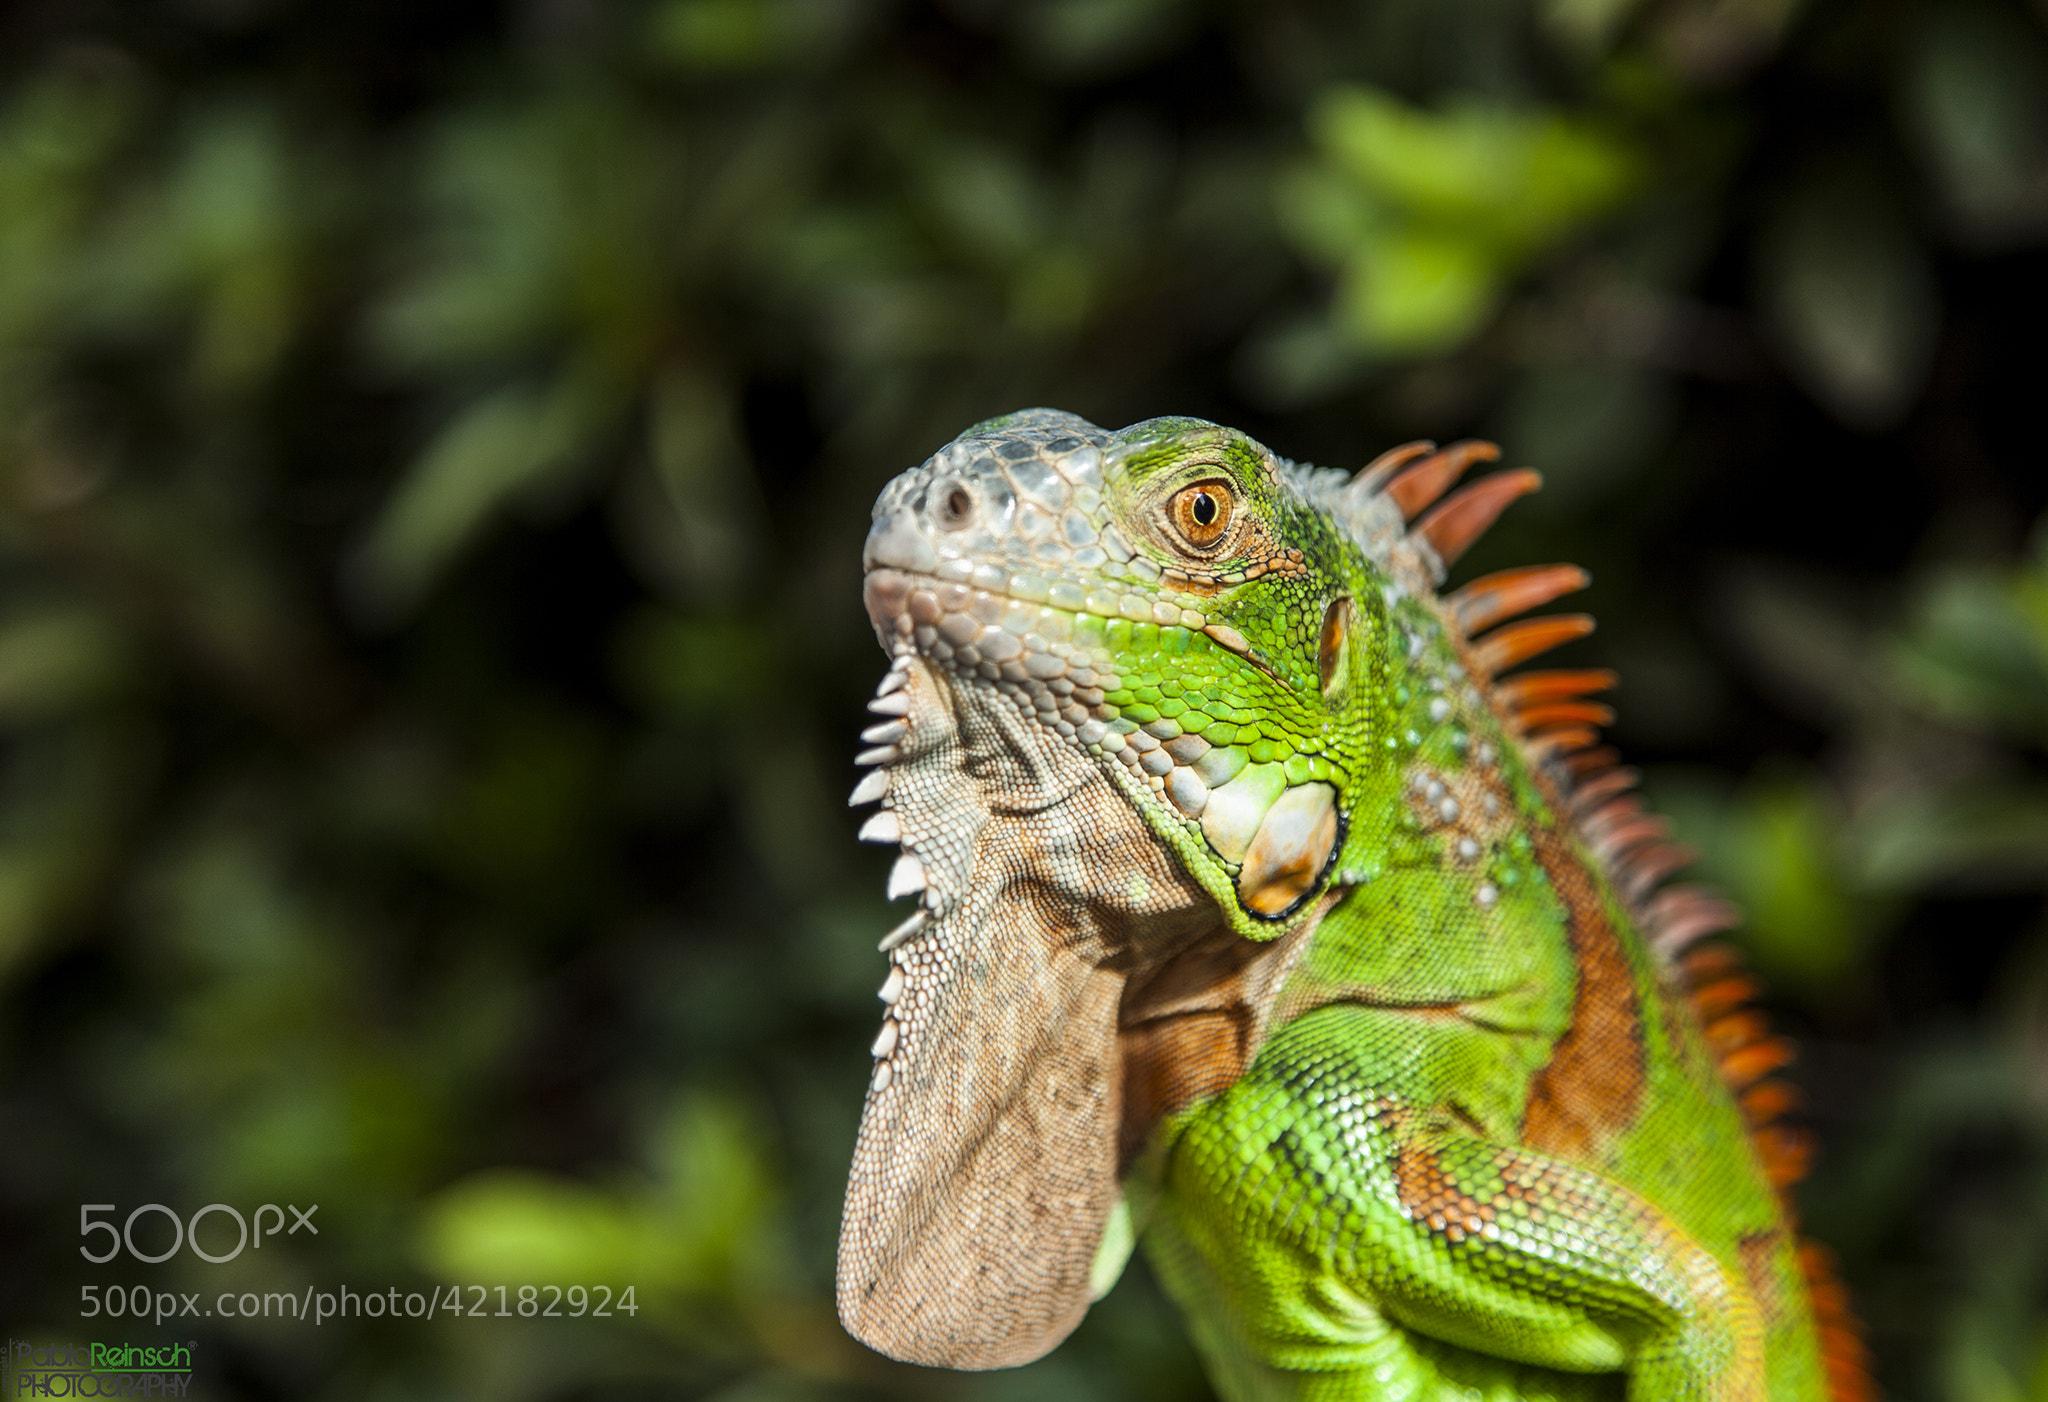 Photograph Iguana.- by Pablo Reinsch on 500px